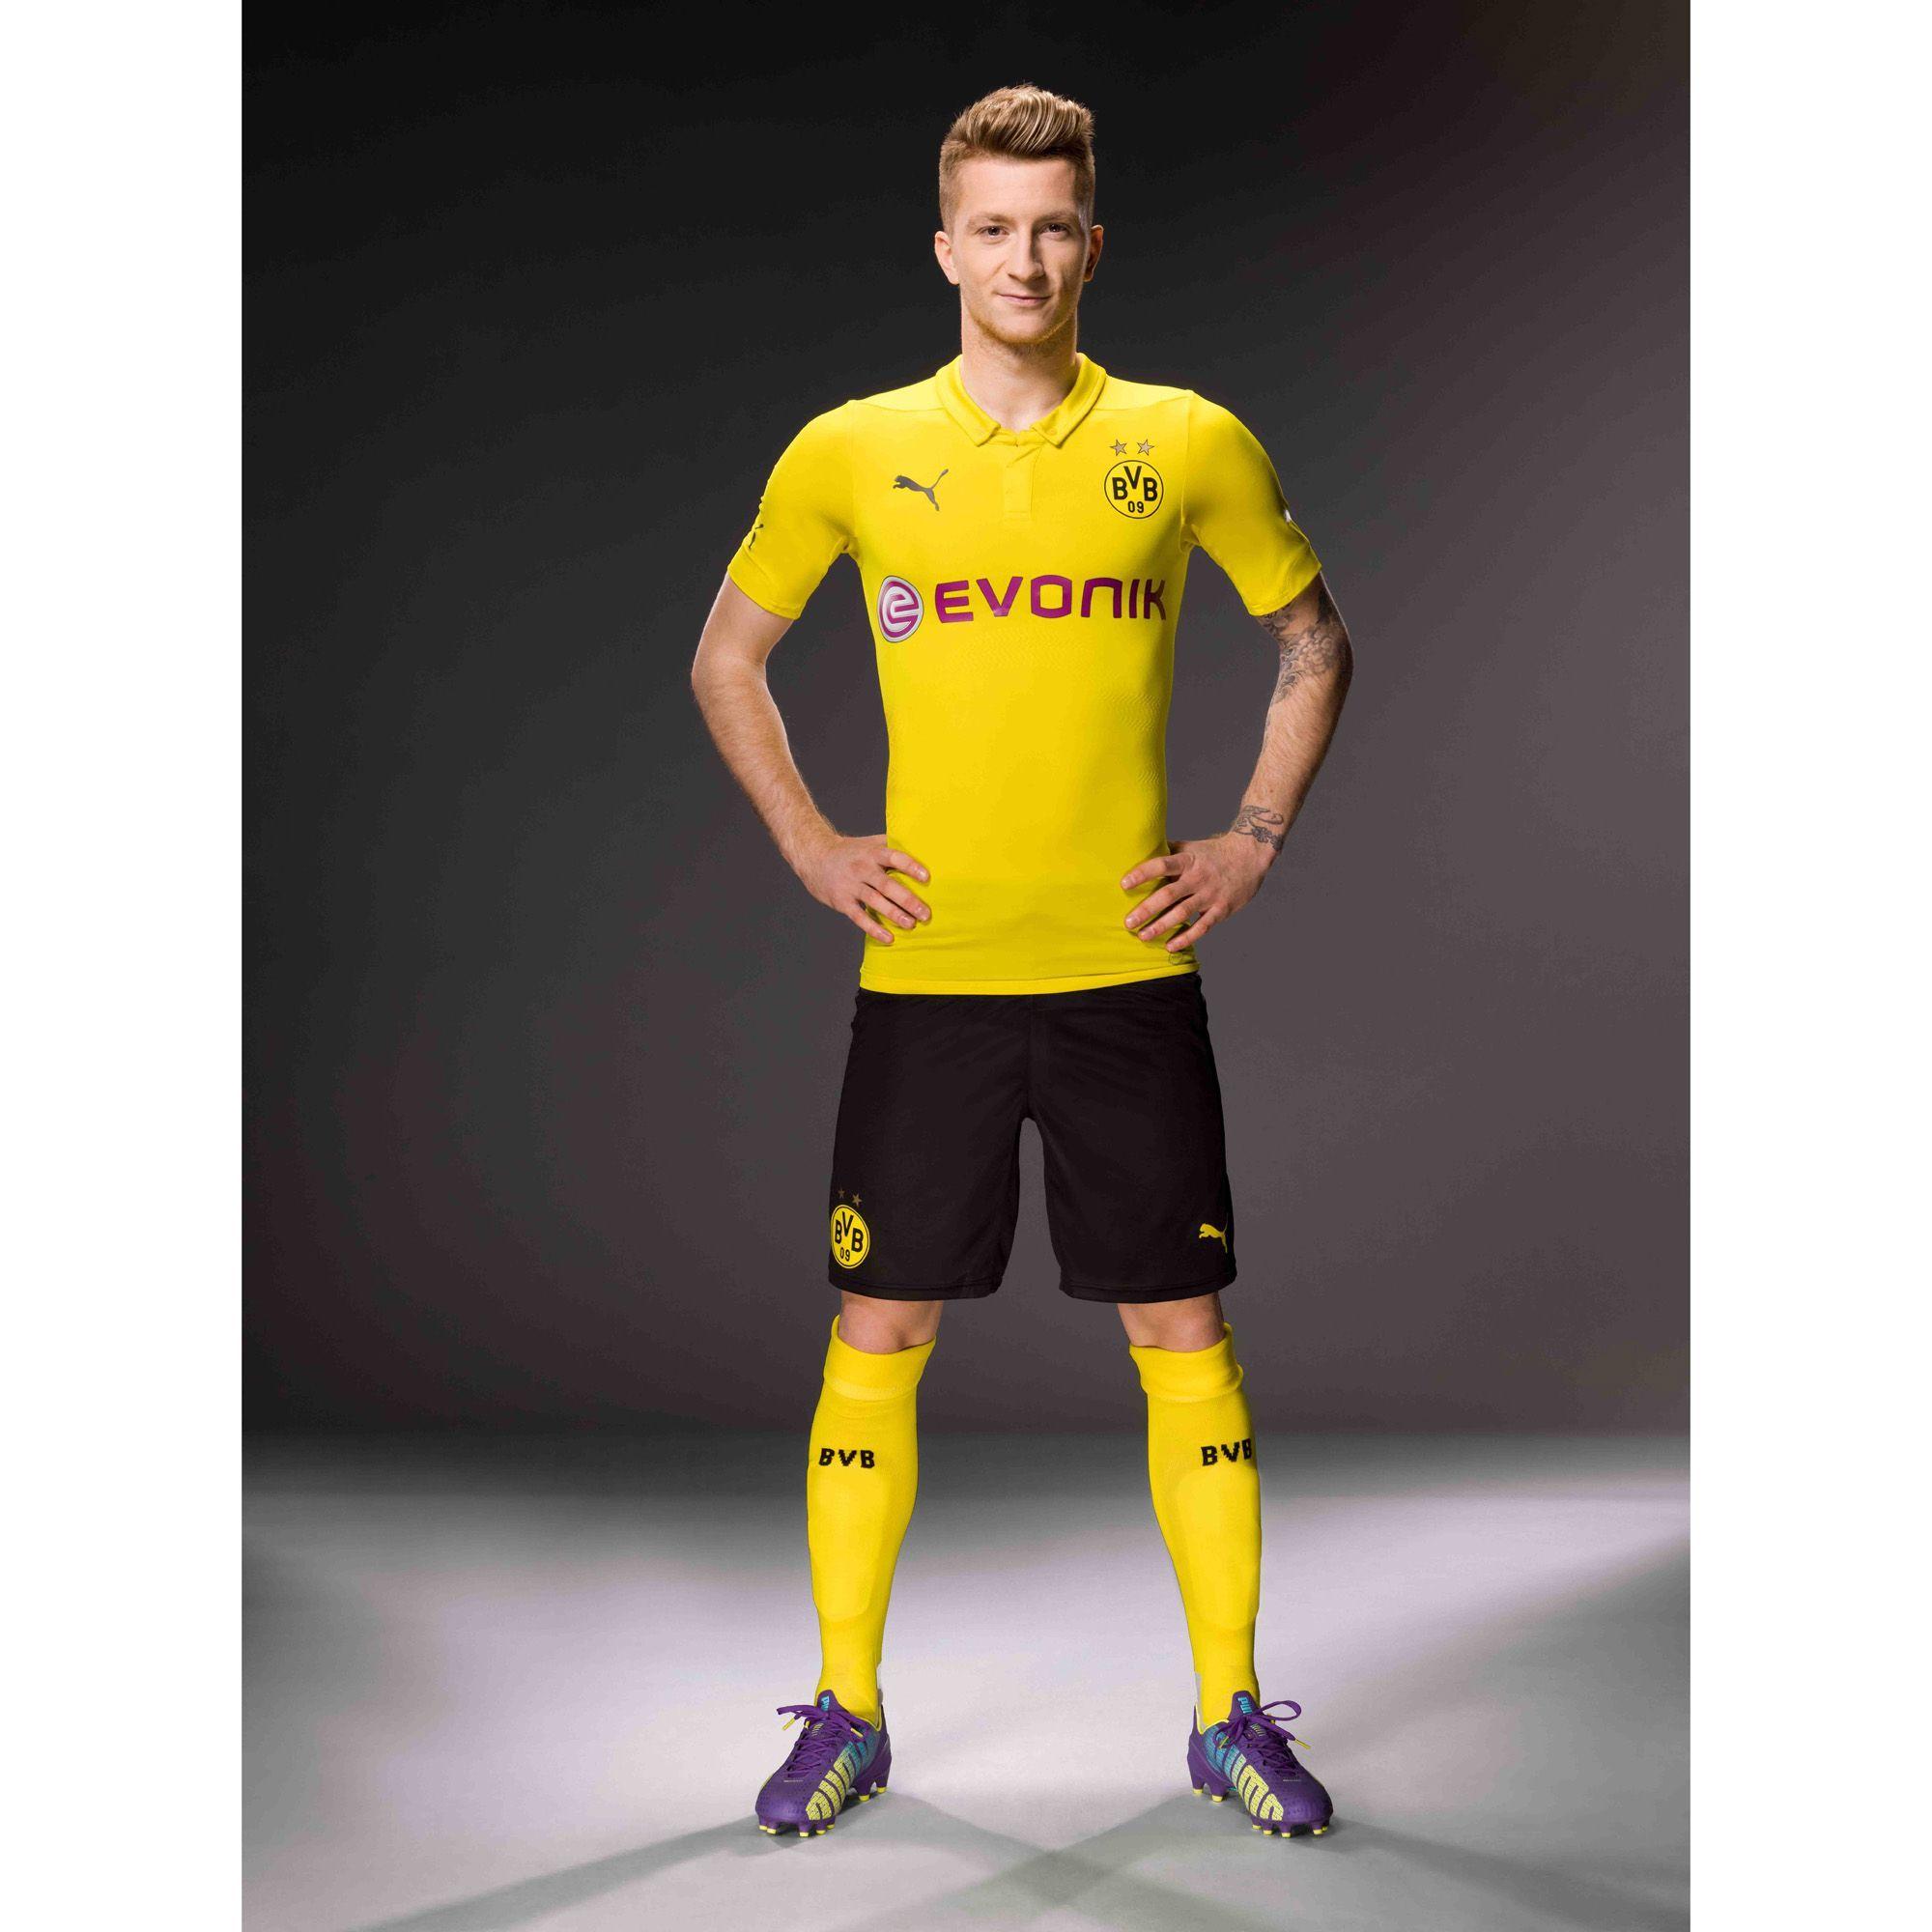 finest selection 6511a 8b1a2 Marco Reus im Borussia Dortmund/BVB - Champions League ...